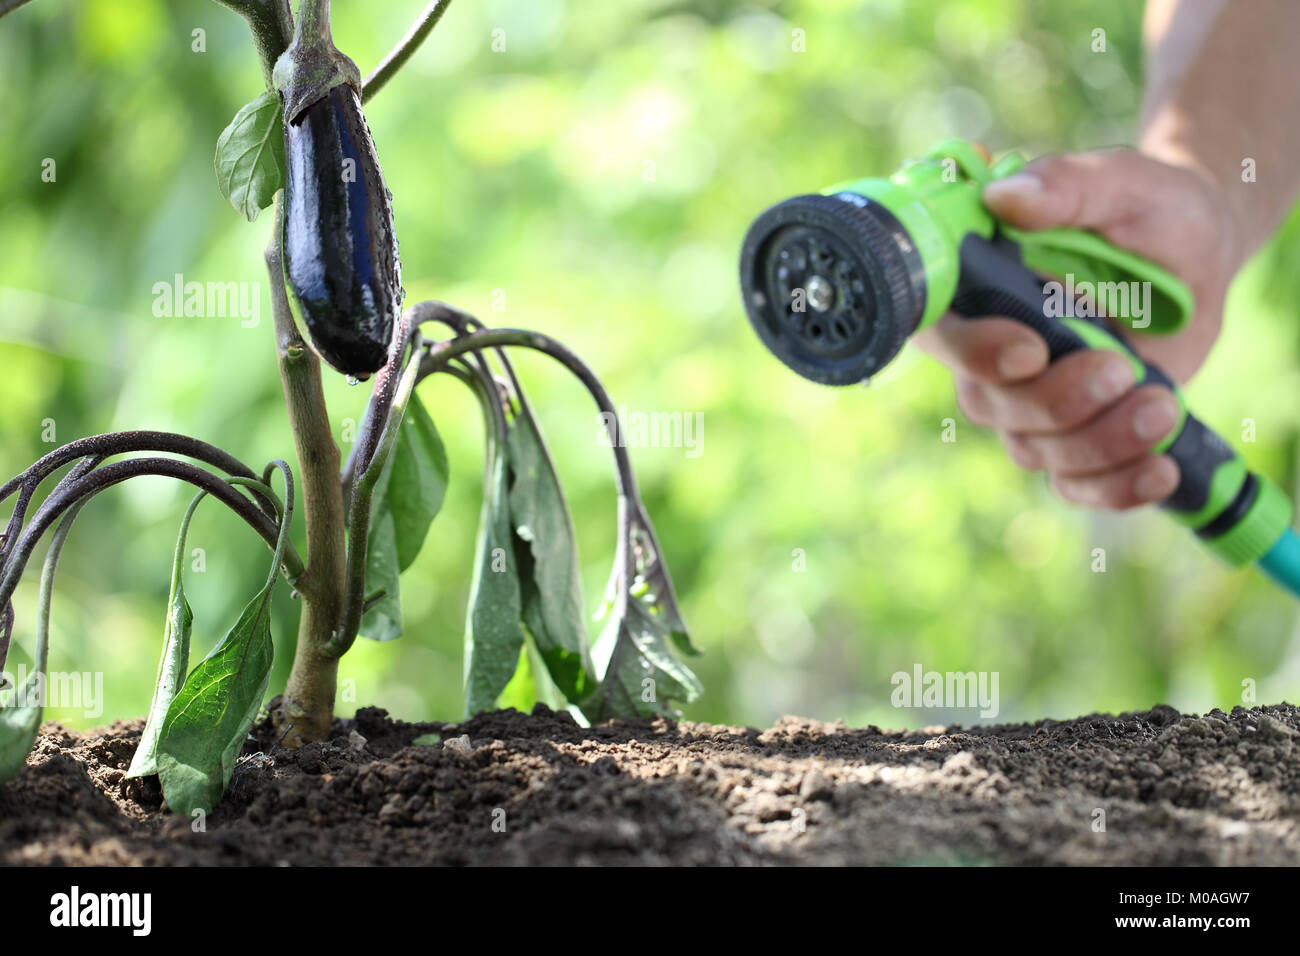 hand watering plants. eggplant in vegetable garden. close up - Stock Image